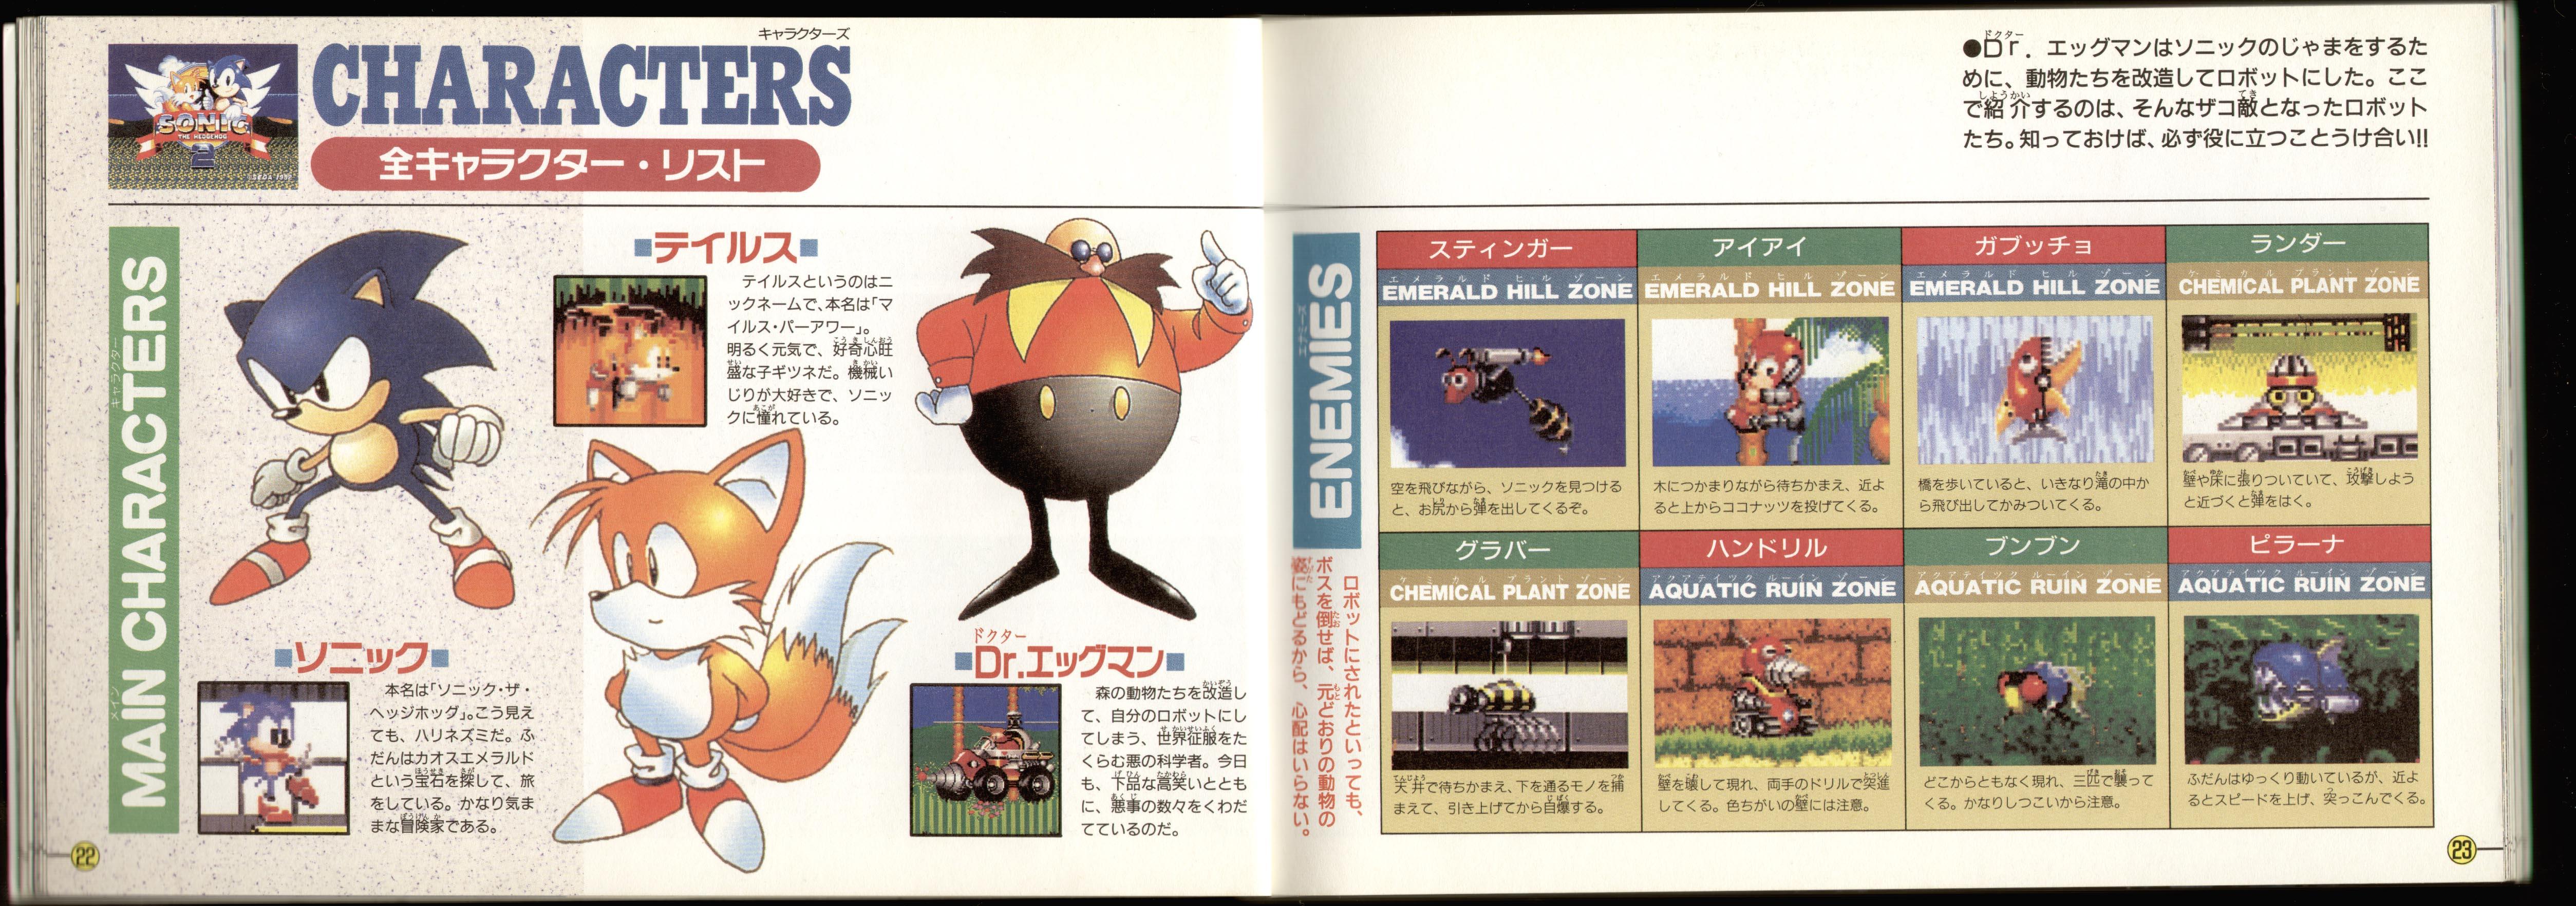 Sonic 2 Manual Art - Pg 11